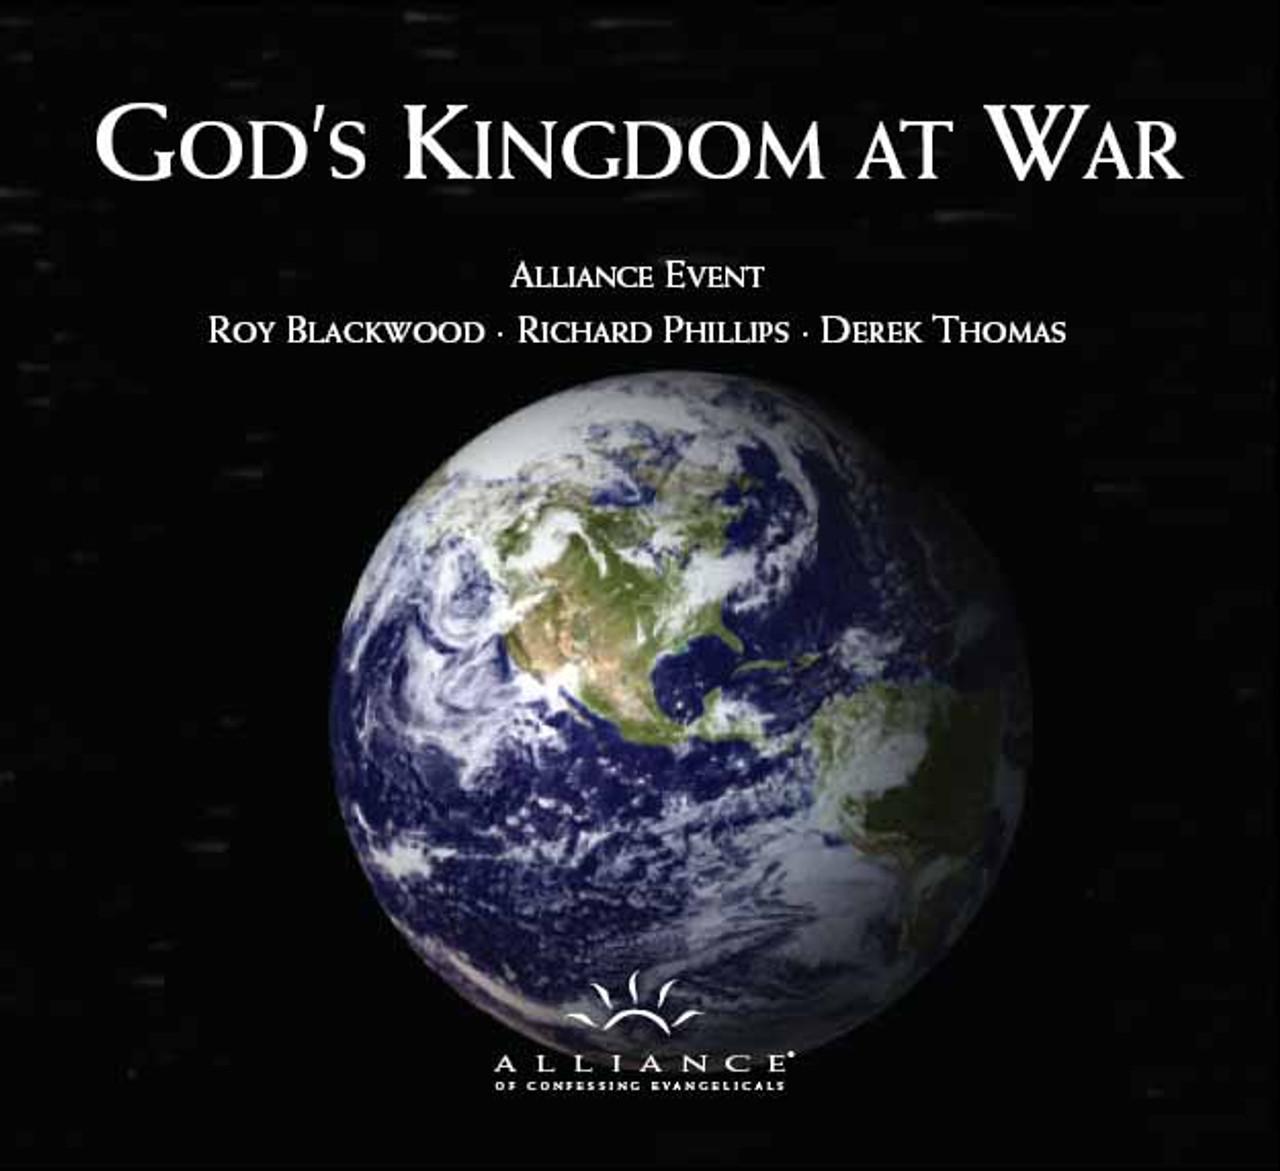 God's Kingdom at War (CD Set)